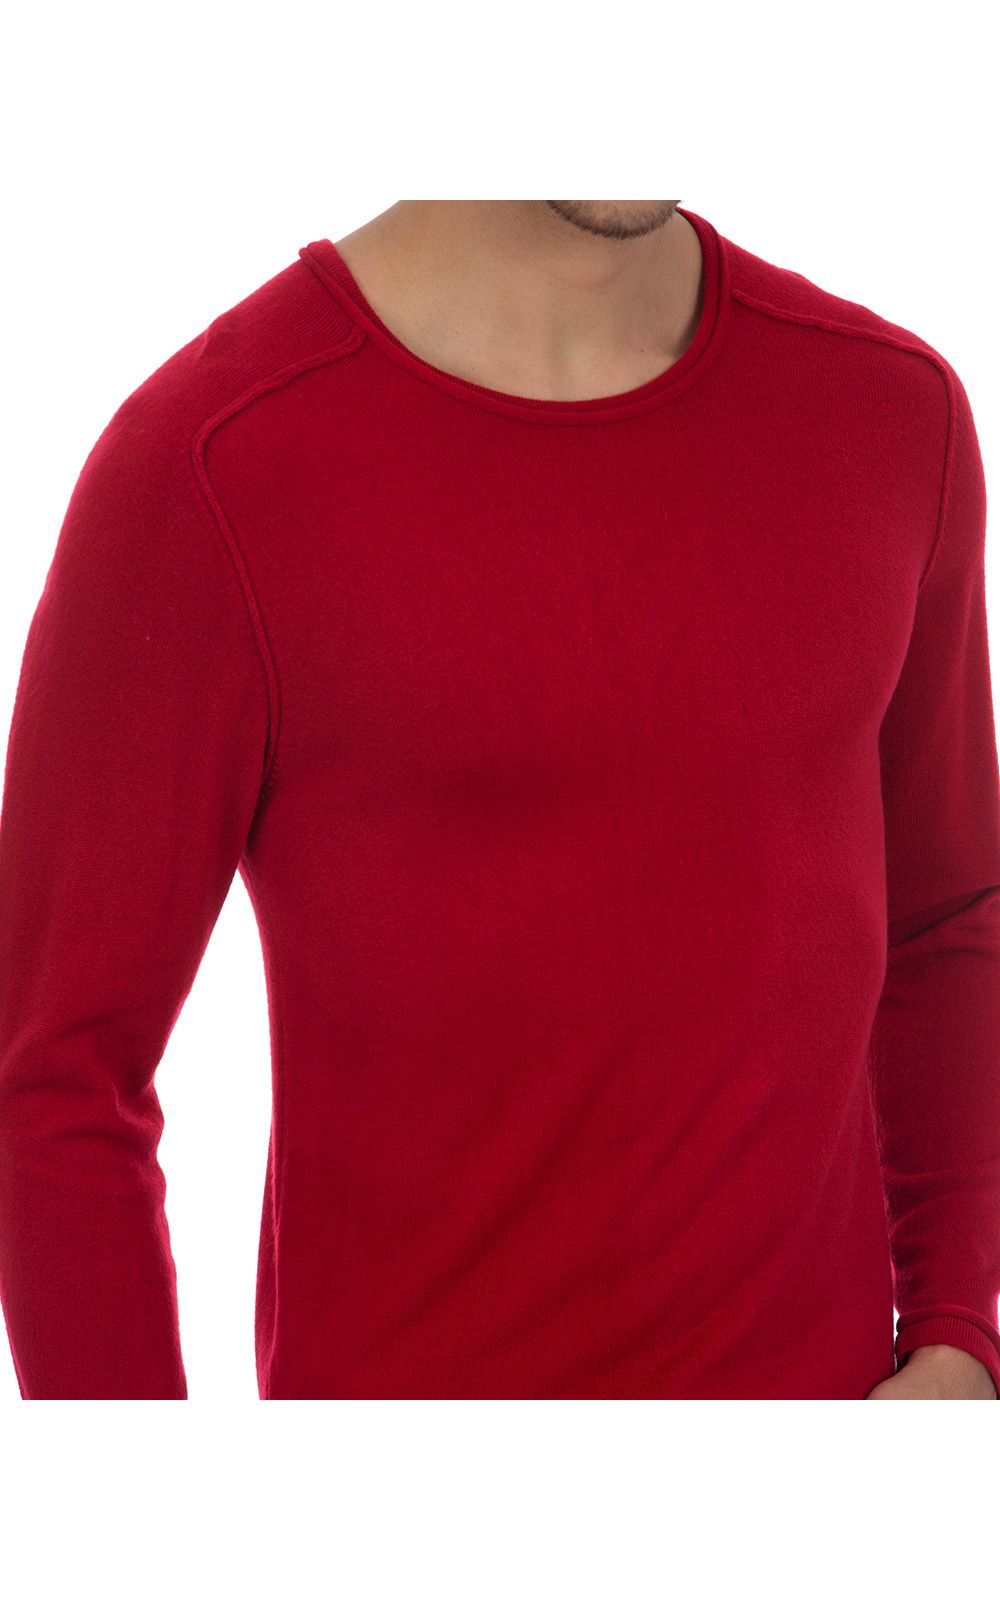 Foto 3 - Malha Masculina Vermelha